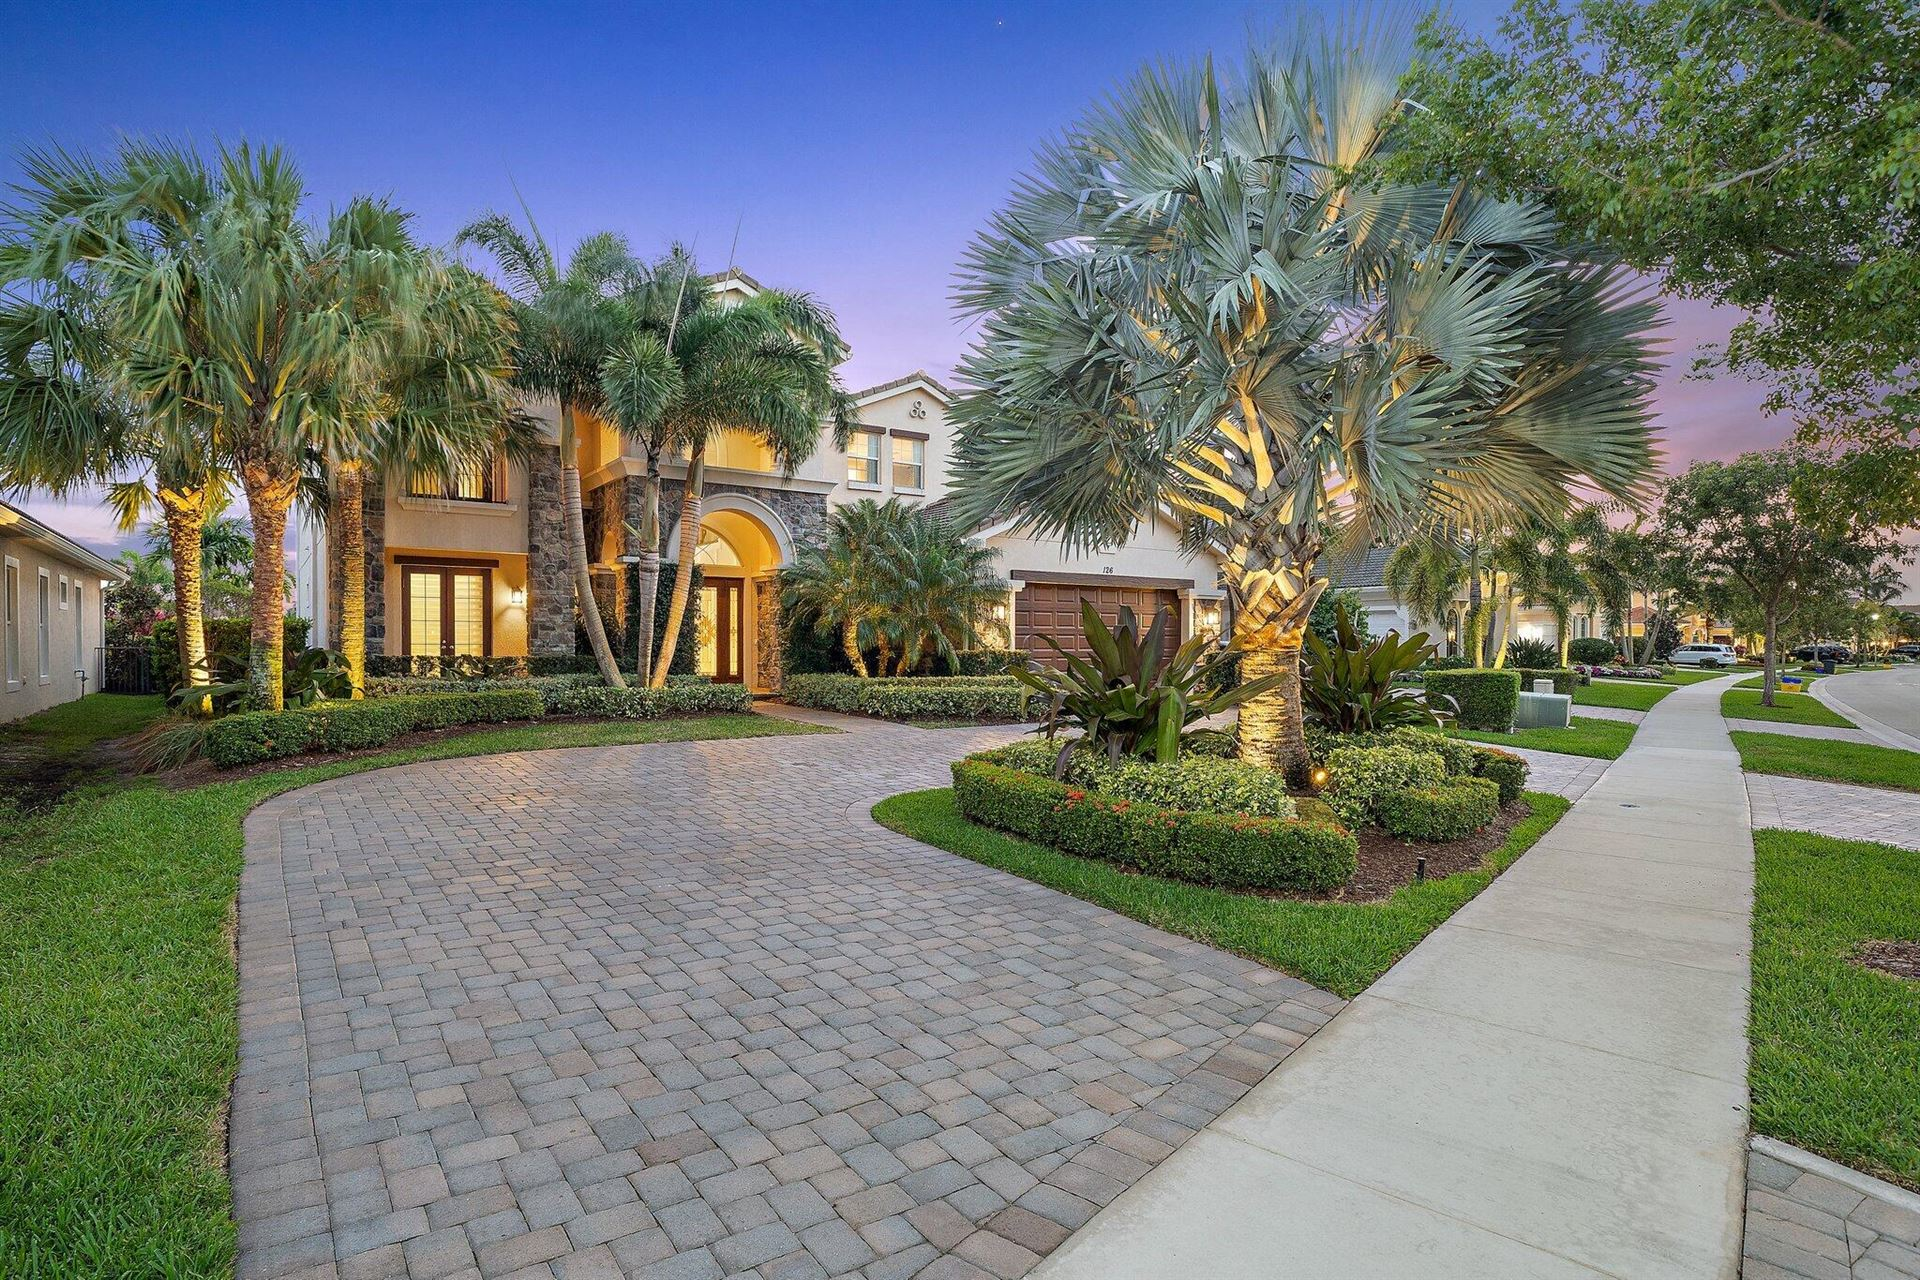 Photo of 126 Carmela Court, Jupiter, FL 33478 (MLS # RX-10696251)